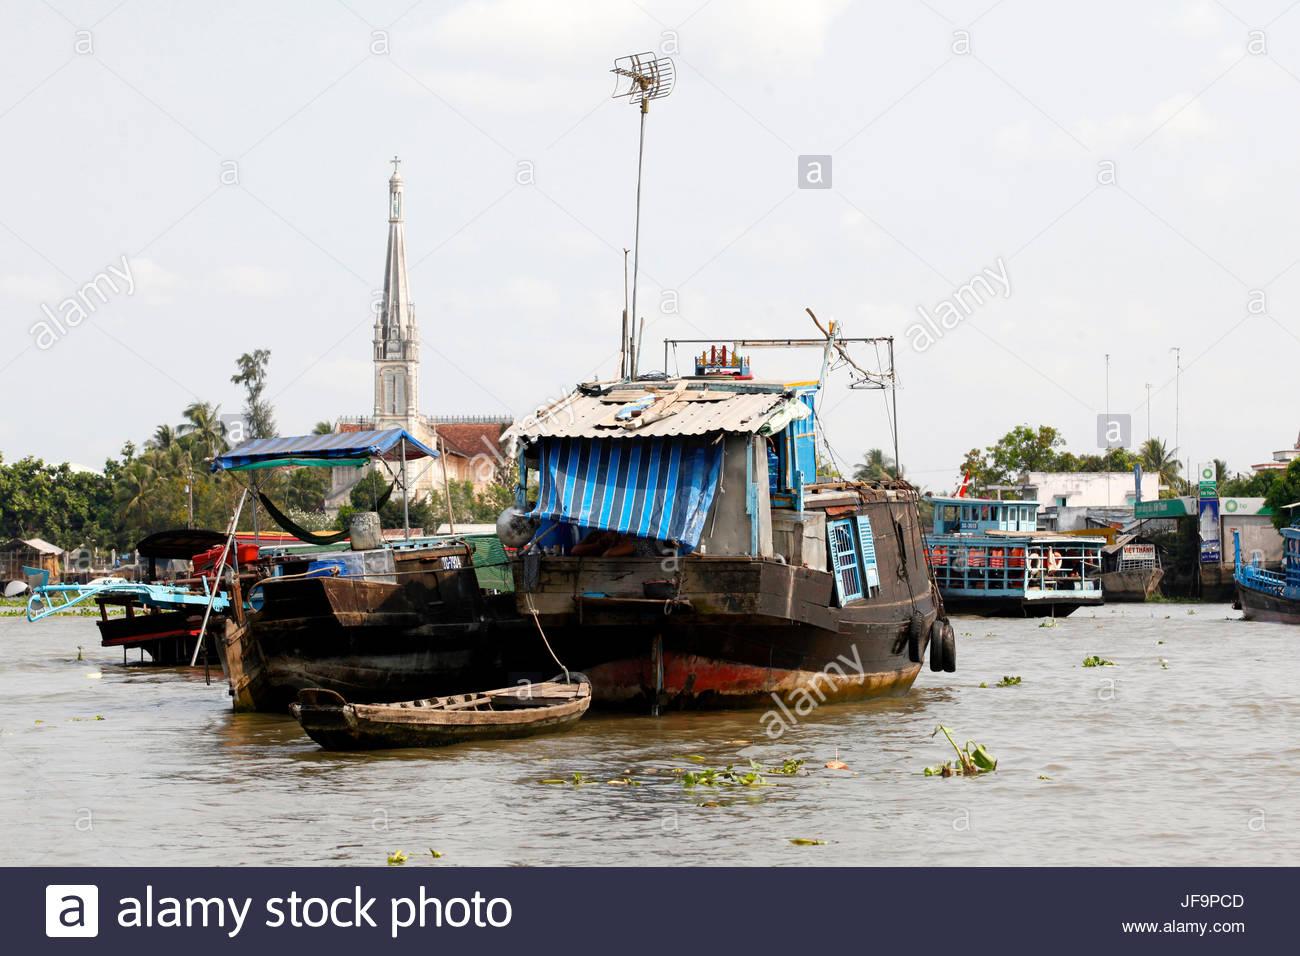 Boats along the Mekong River. - Stock Image